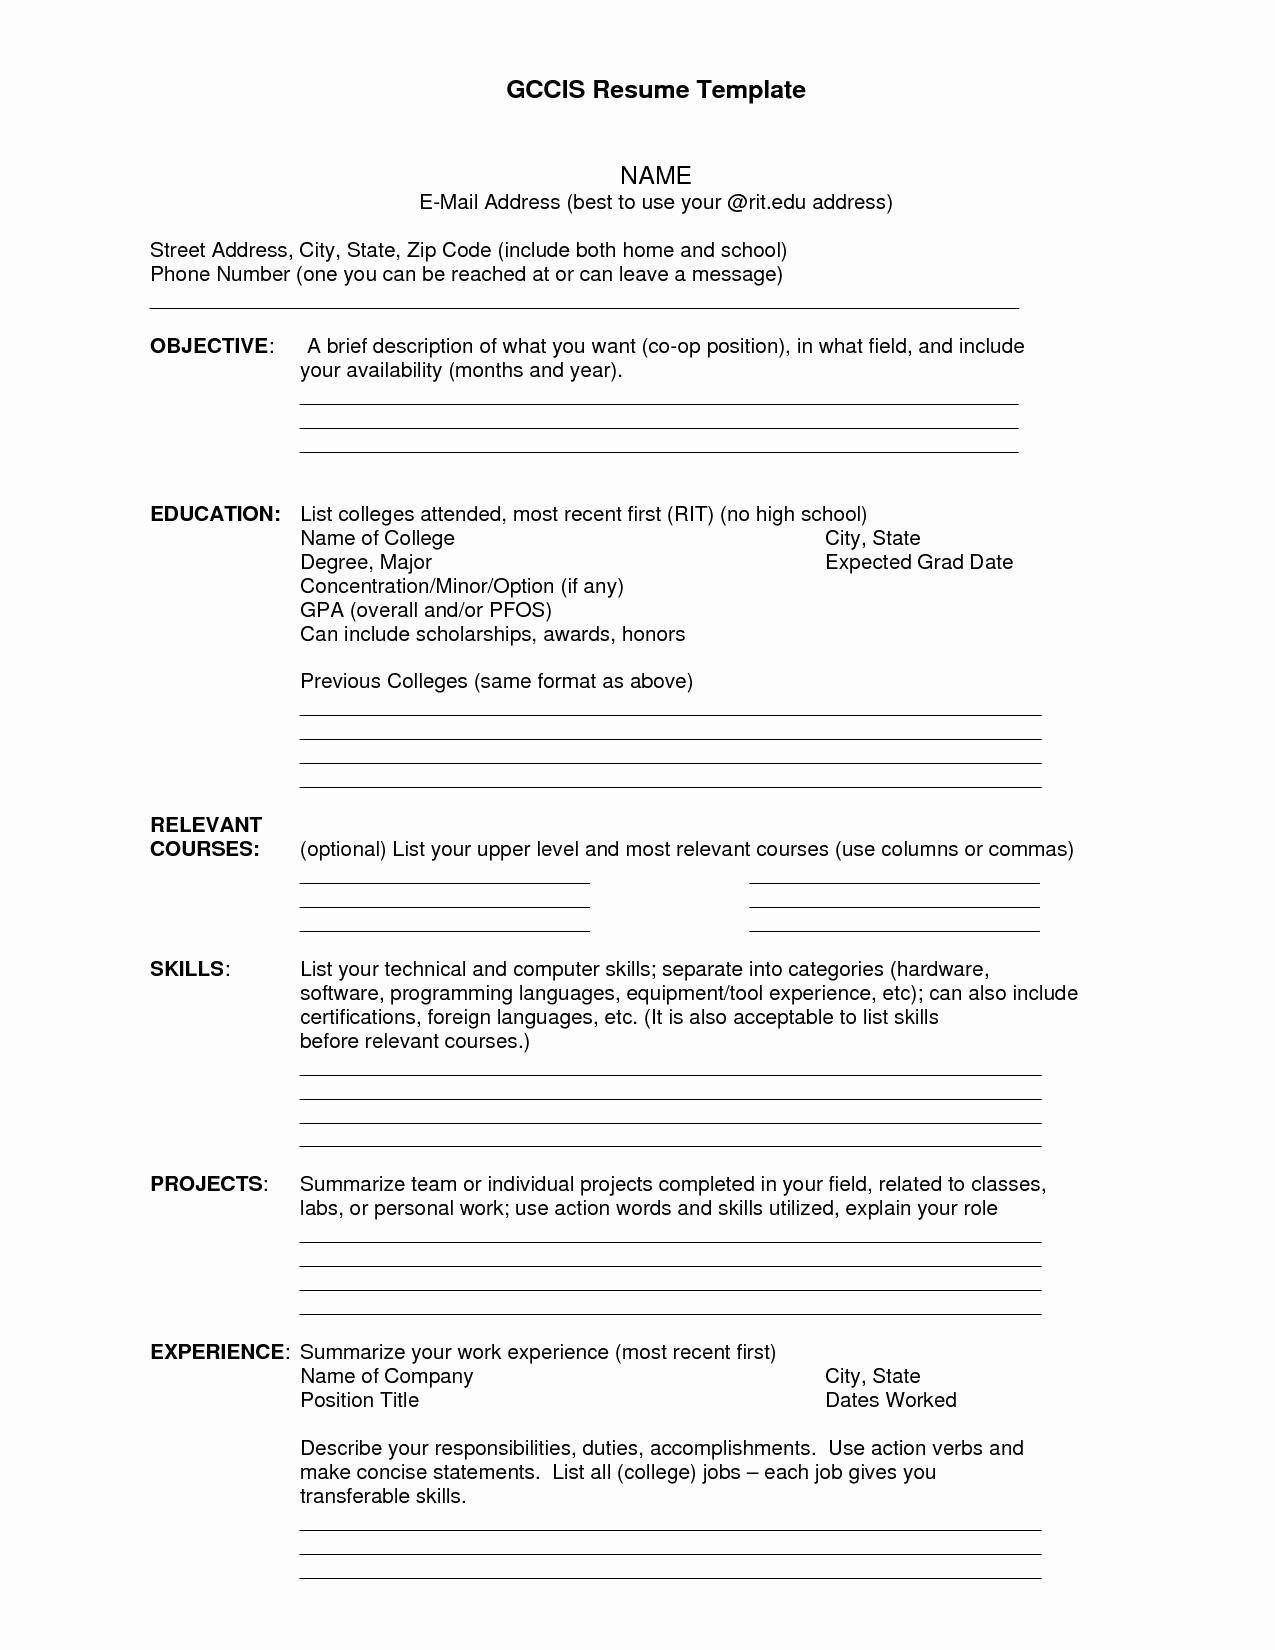 professional term paper ghostwriter websites for university